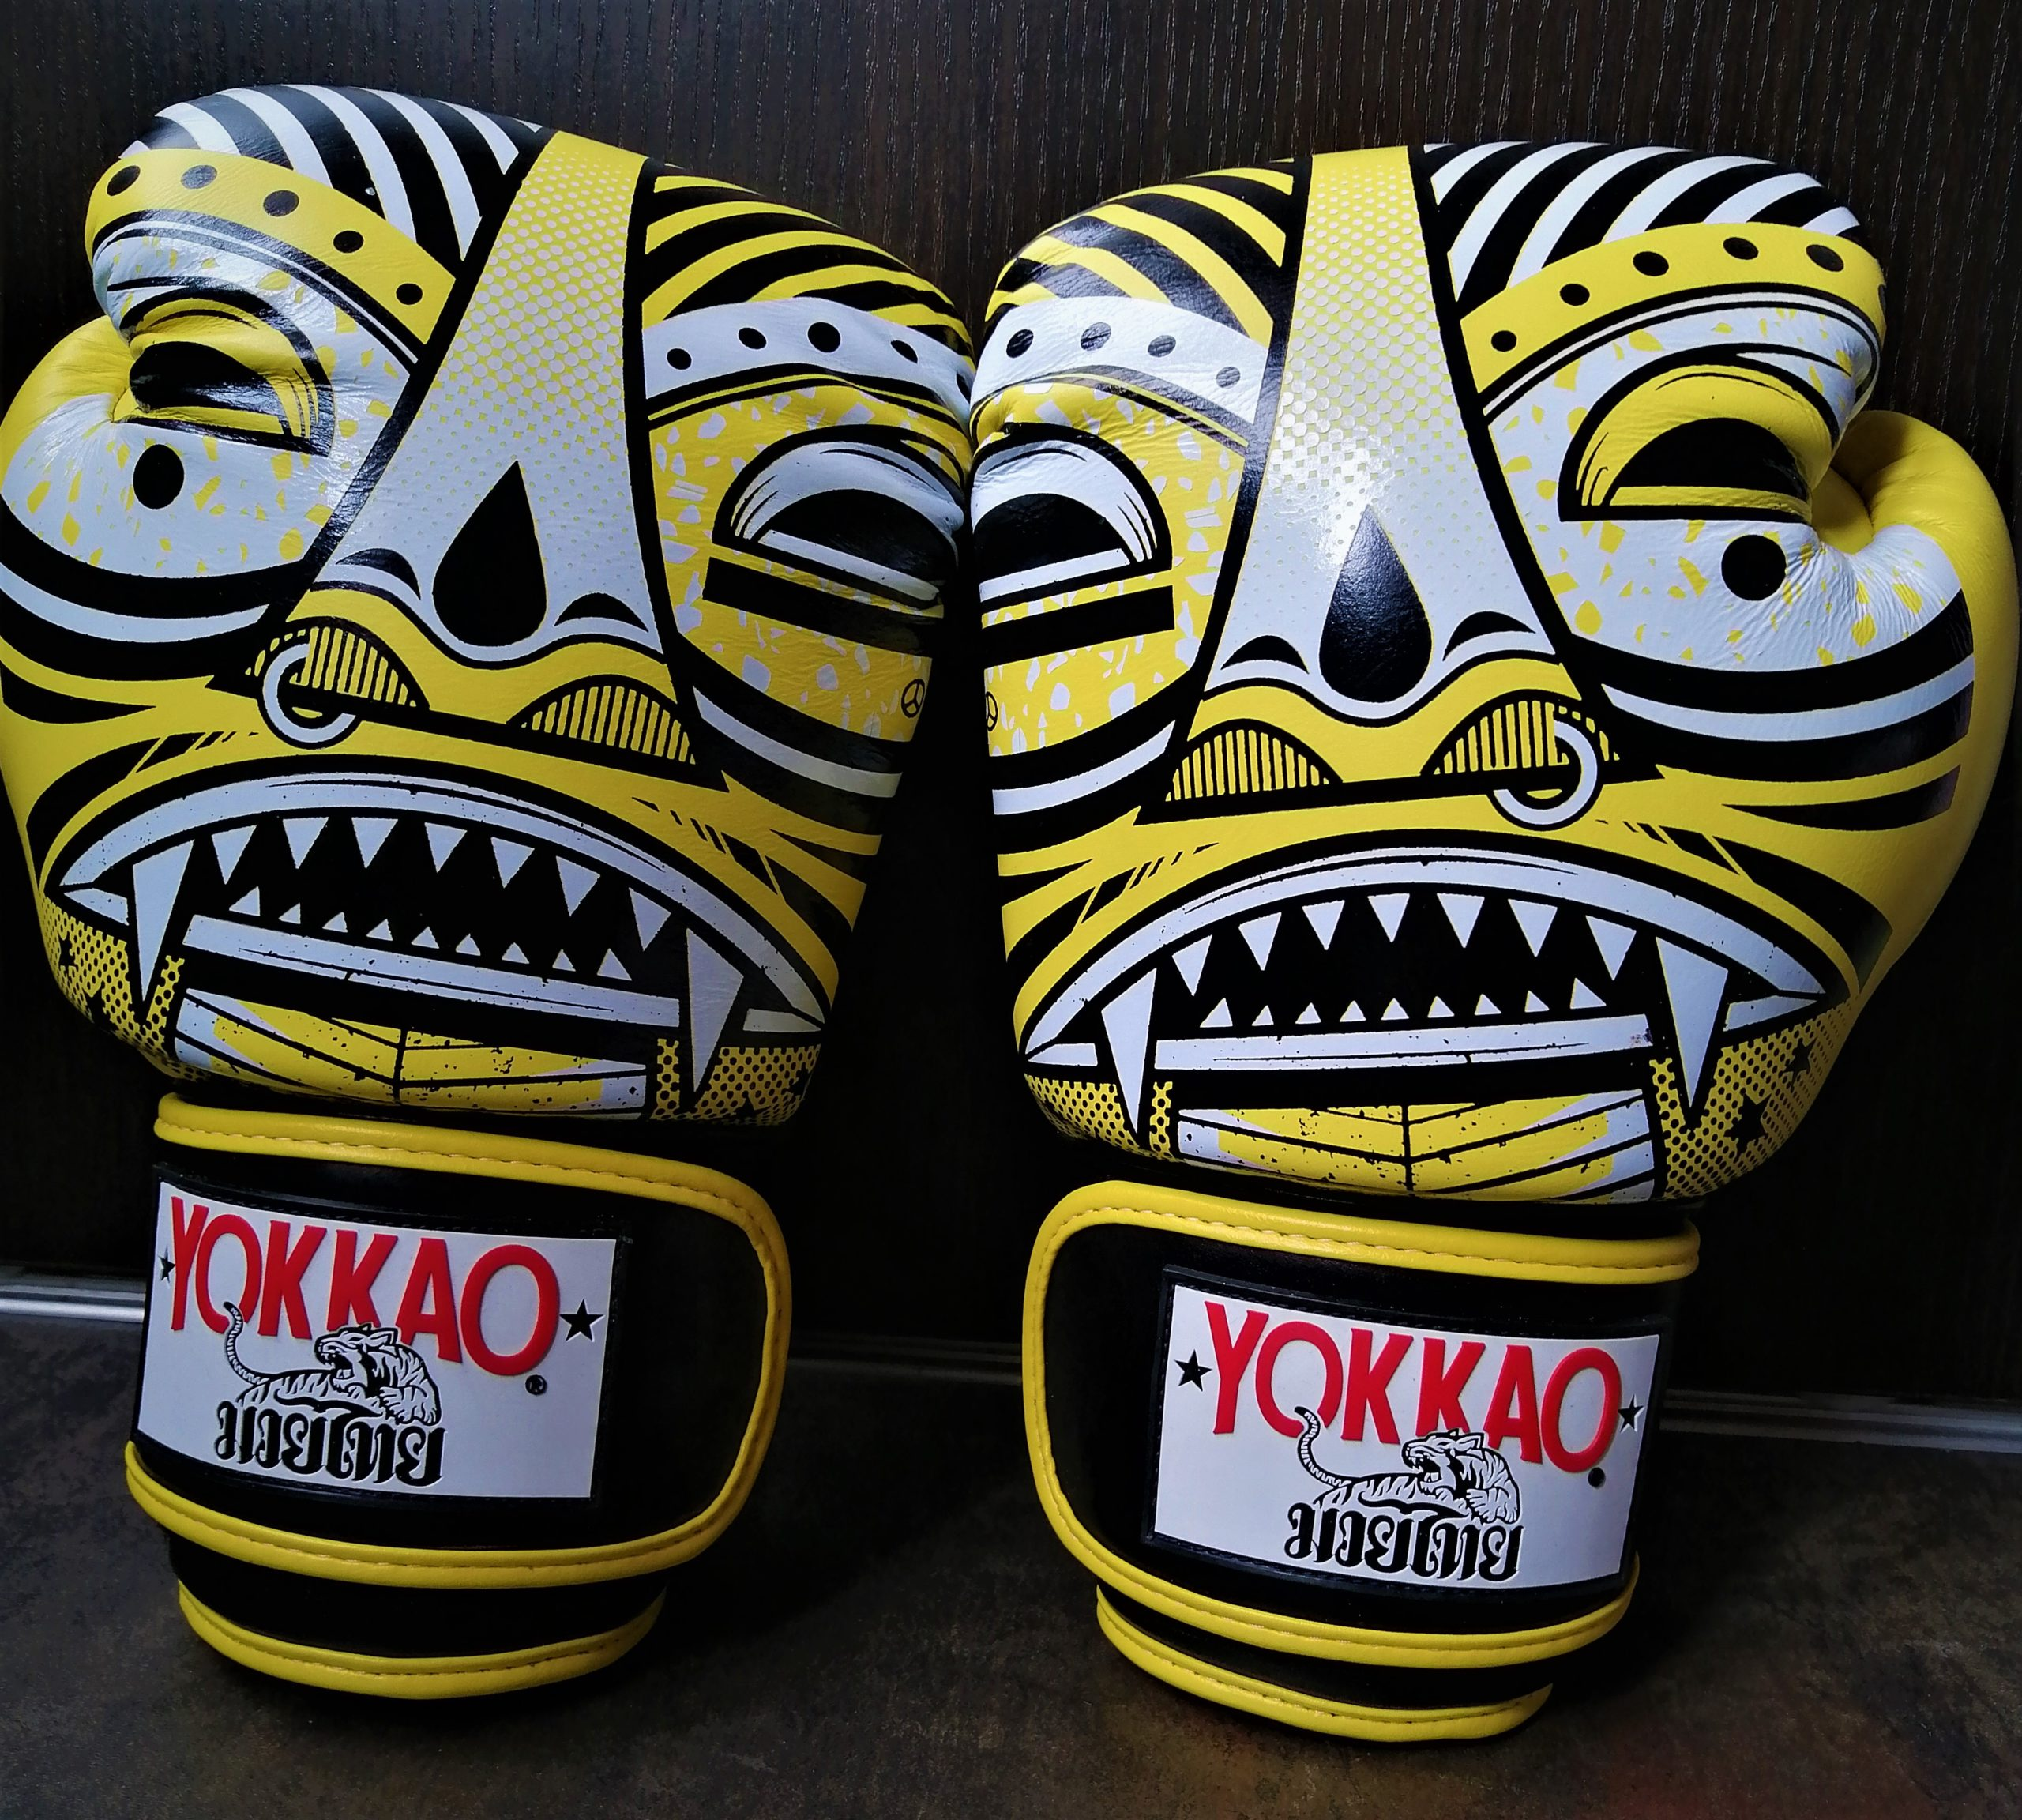 Yokkao Mayan Muay Thai Gloves Review